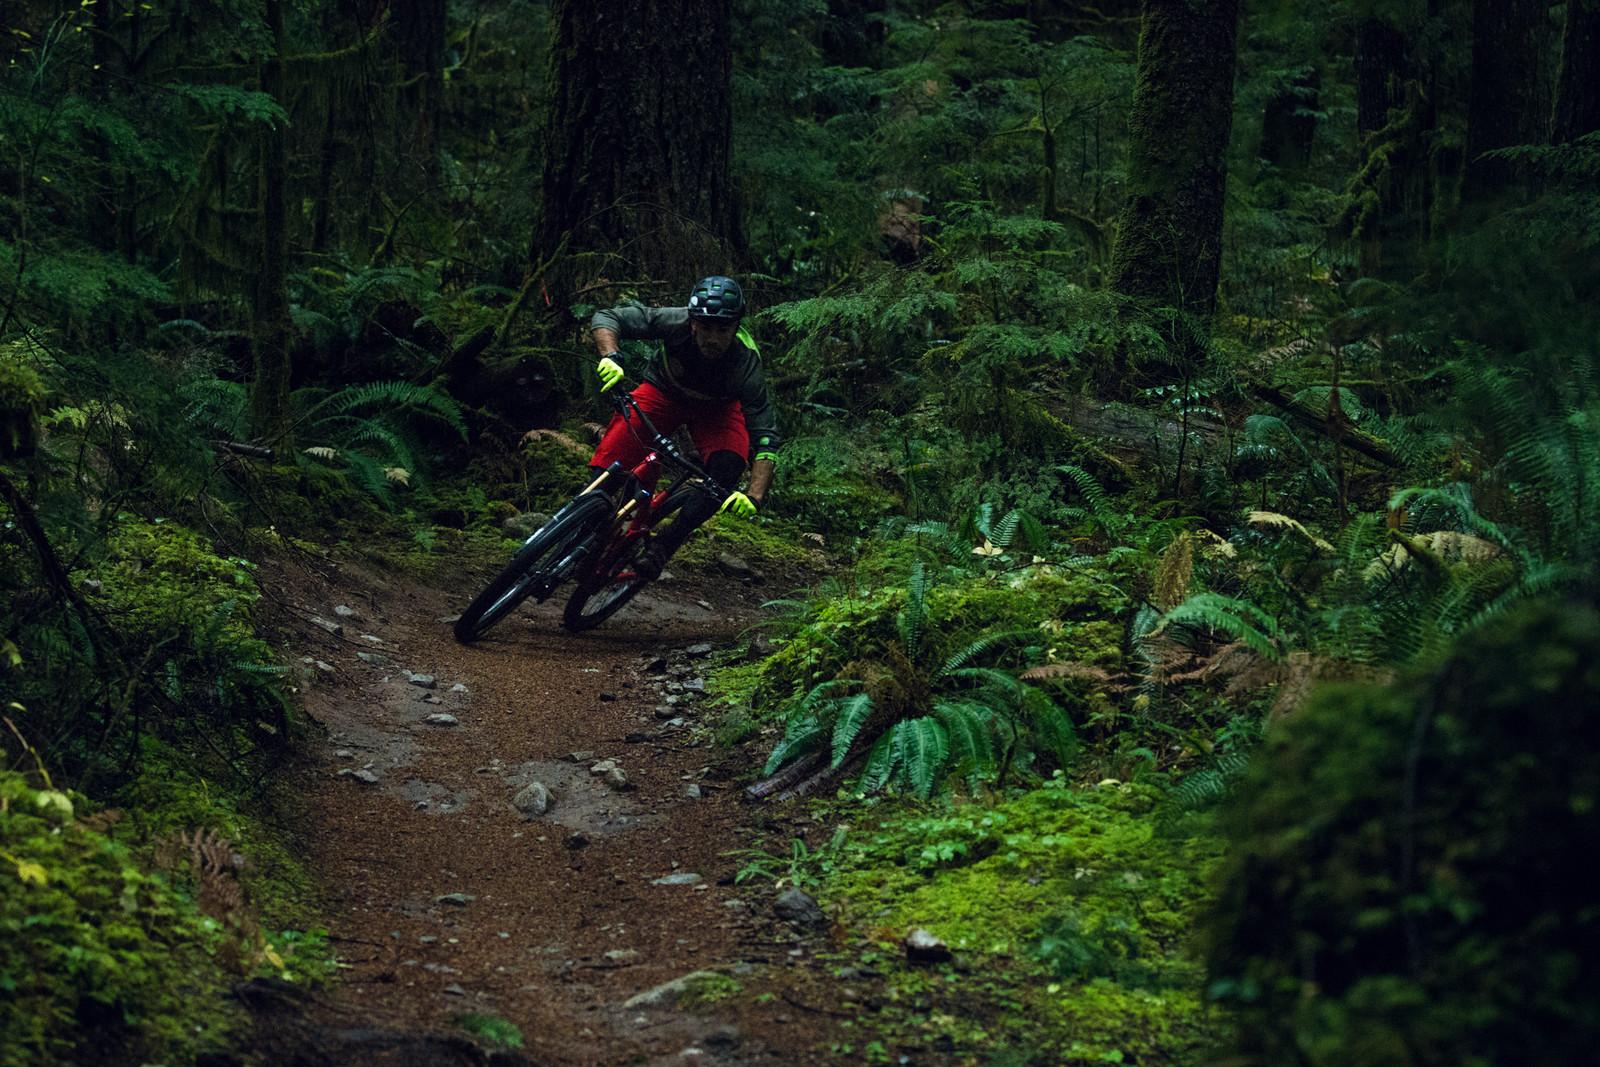 2017 Trek Slash 29 9.9 Race Shop Limited - Tested: 2017 Trek Slash 29 9.9 Race Shop Limited - Bonus Gallery - Mountain Biking Pictures - Vital MTB